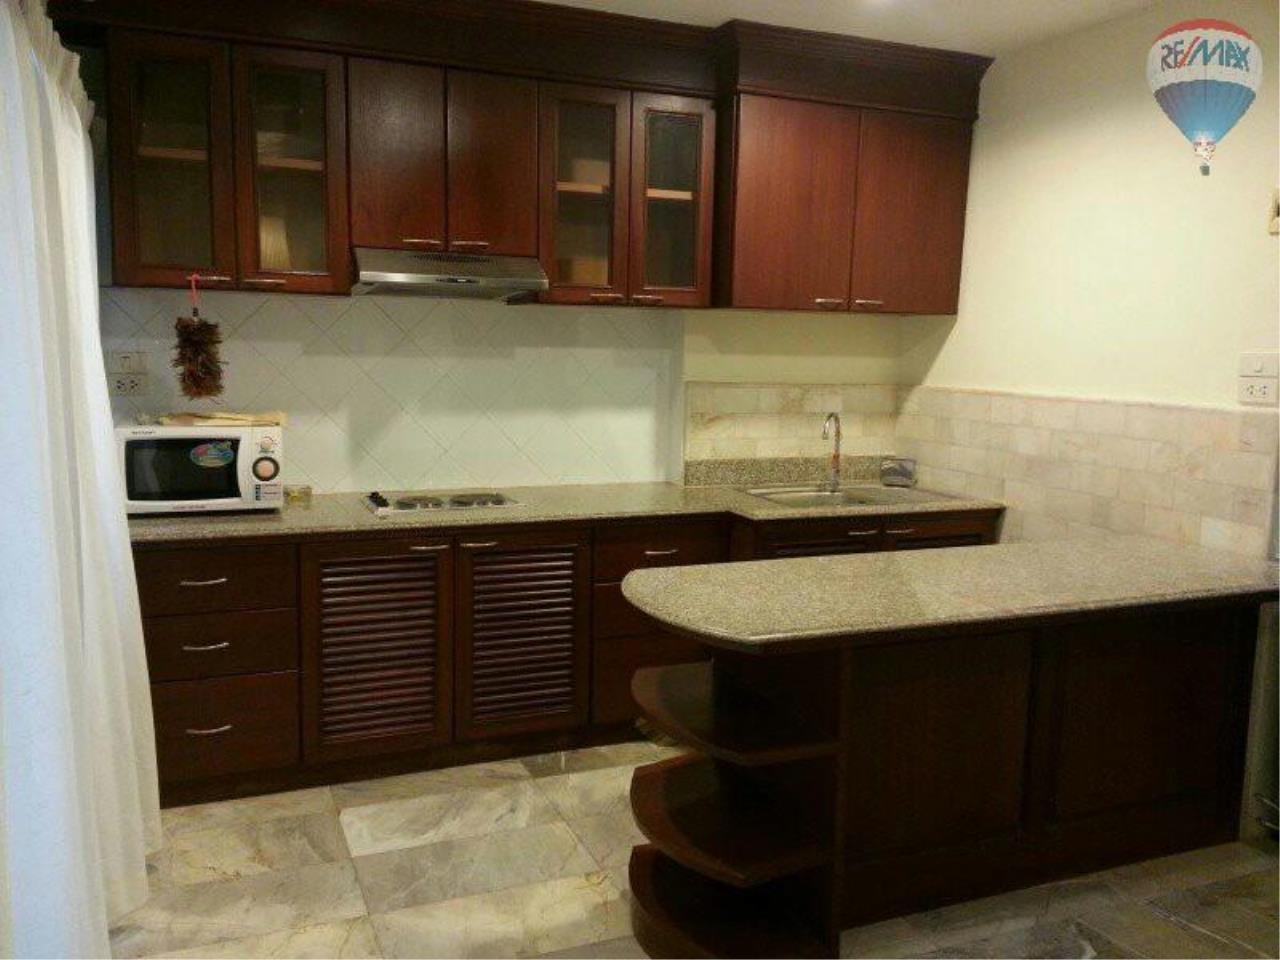 RE/MAX Properties Agency's 1 Bedroom 56 Sq.m for SALE at Saranjai Mansion,Sukhumvit Soi 4 (Nana) 5